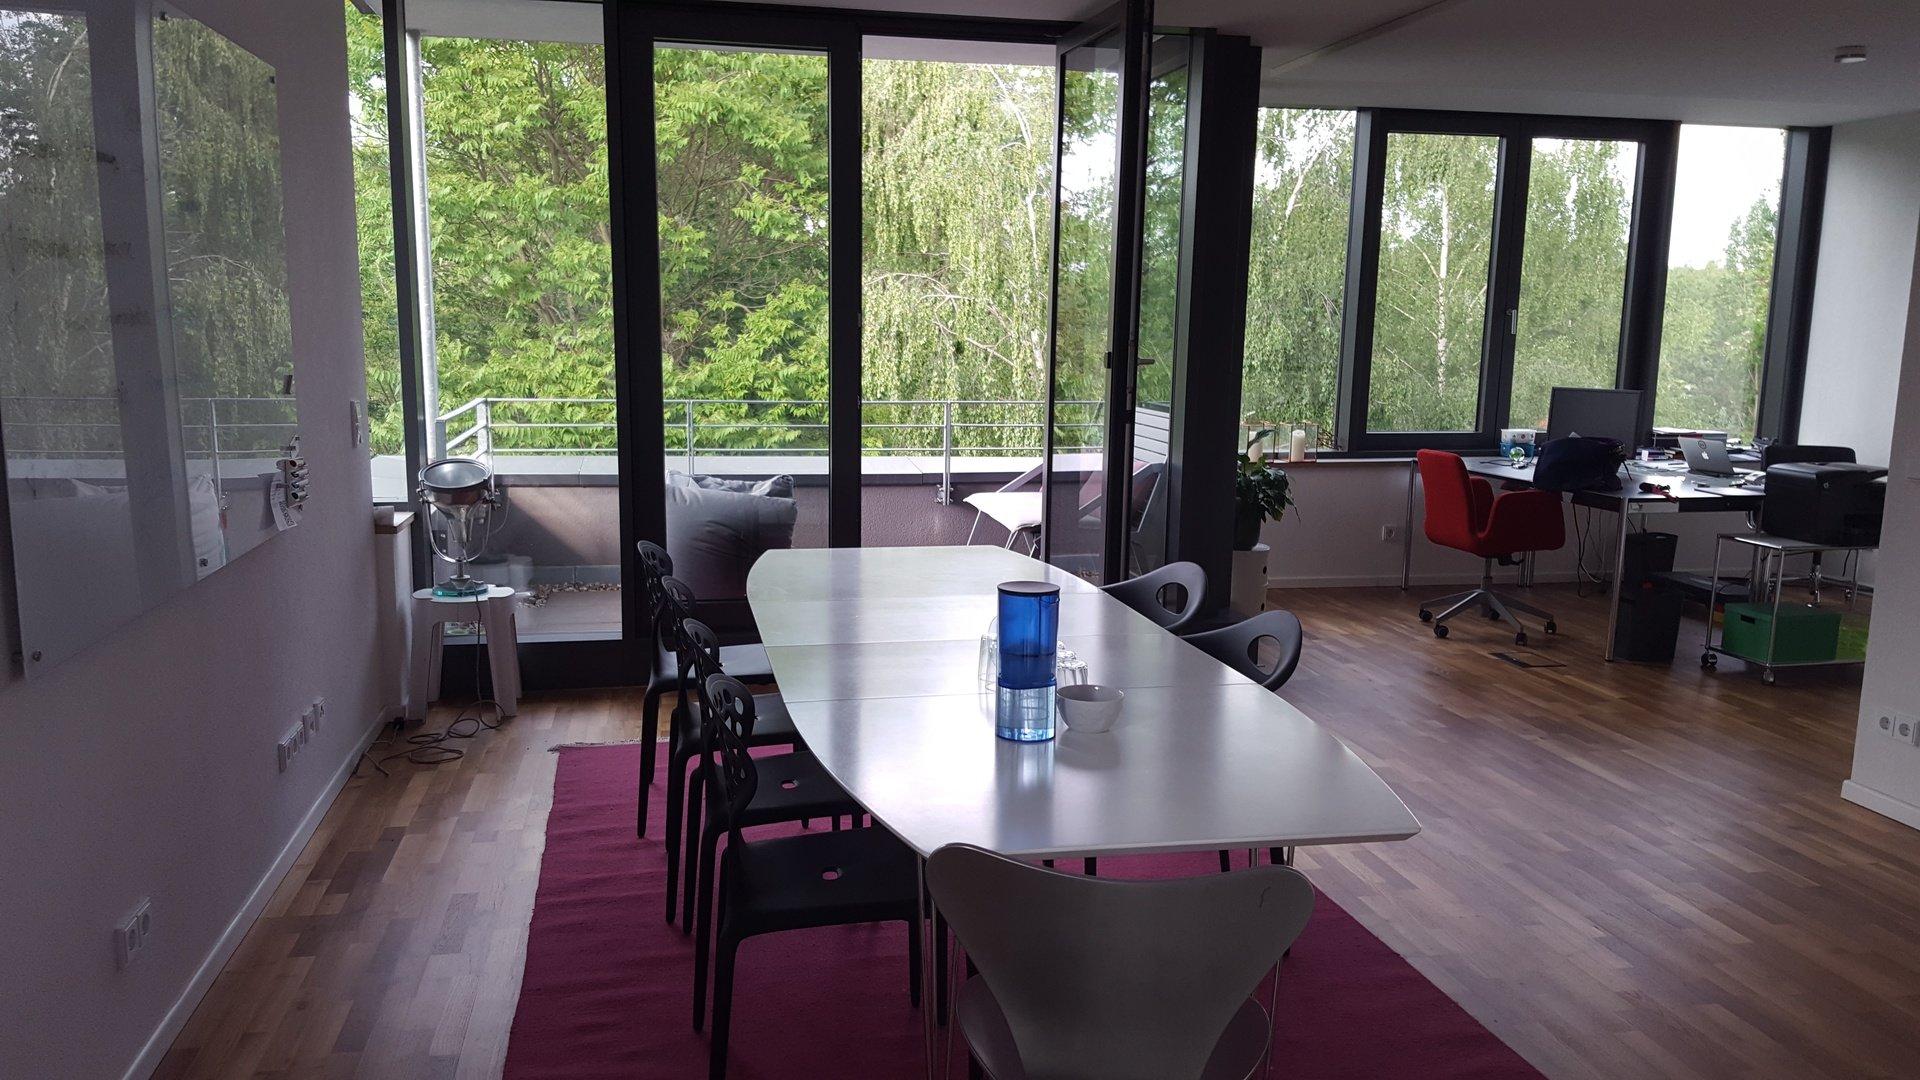 Berlin conference rooms Meetingraum Büro die Gründertrainerin image 0